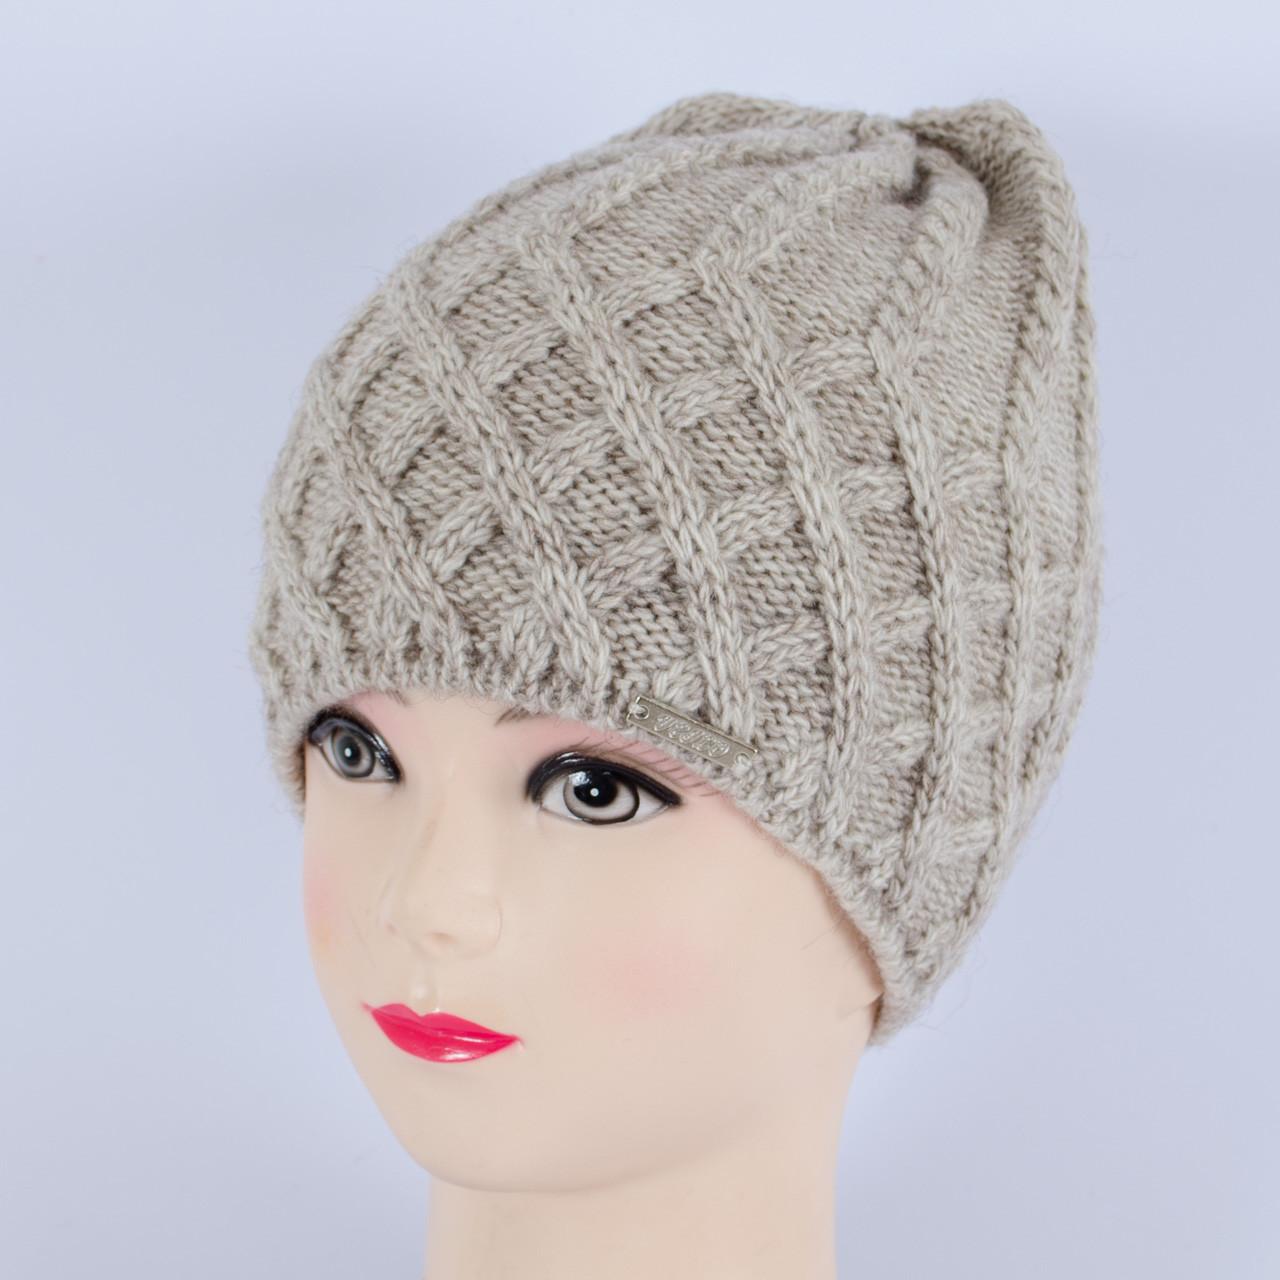 Вязаная женская шапка, (Лен)